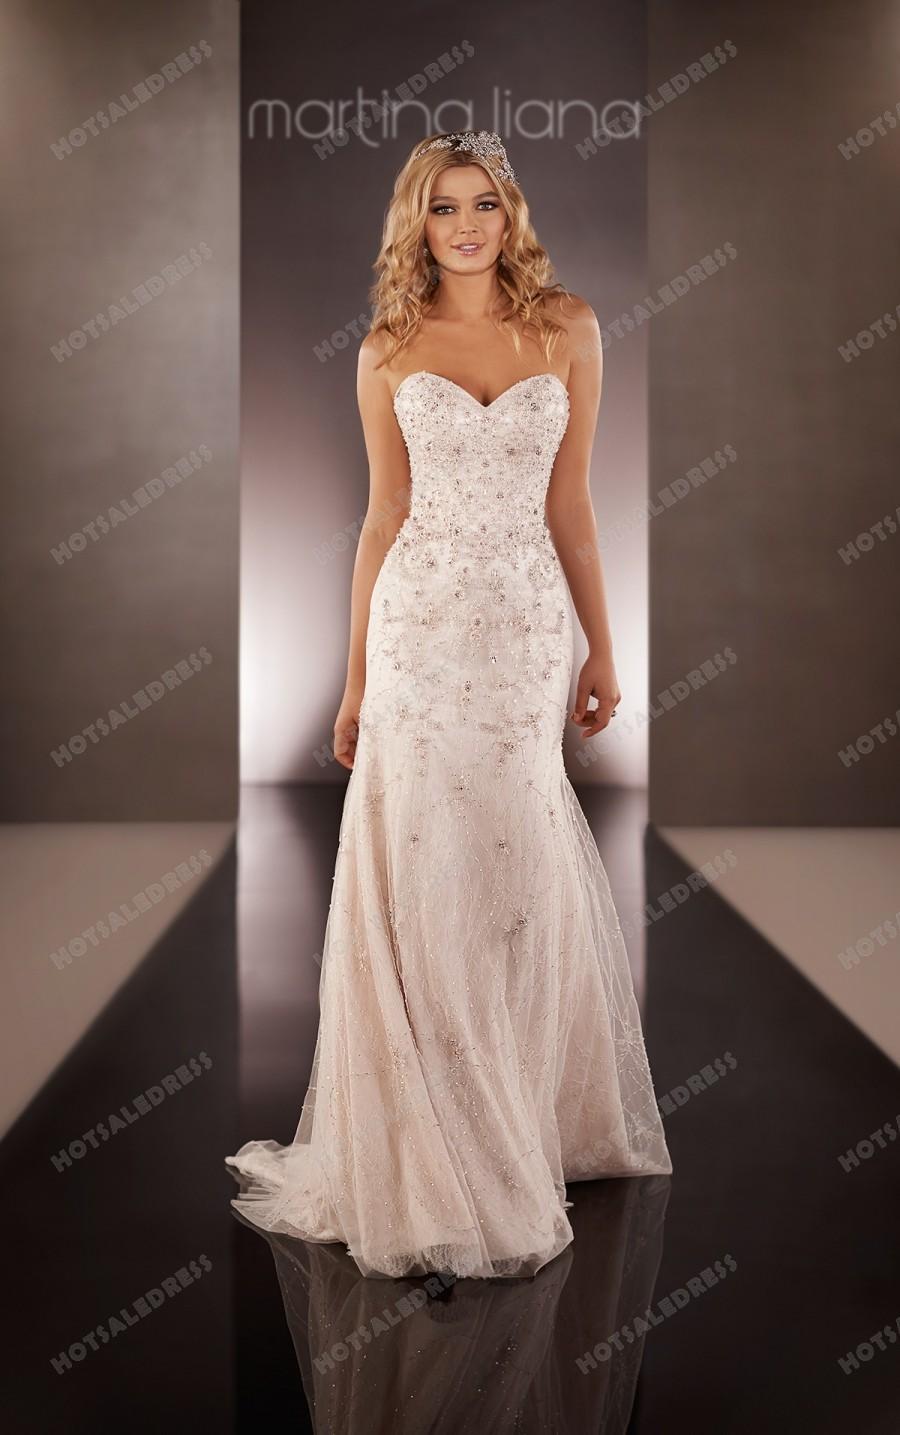 Hochzeit - Martina Liana Beaded Wedding Dresses Style 618